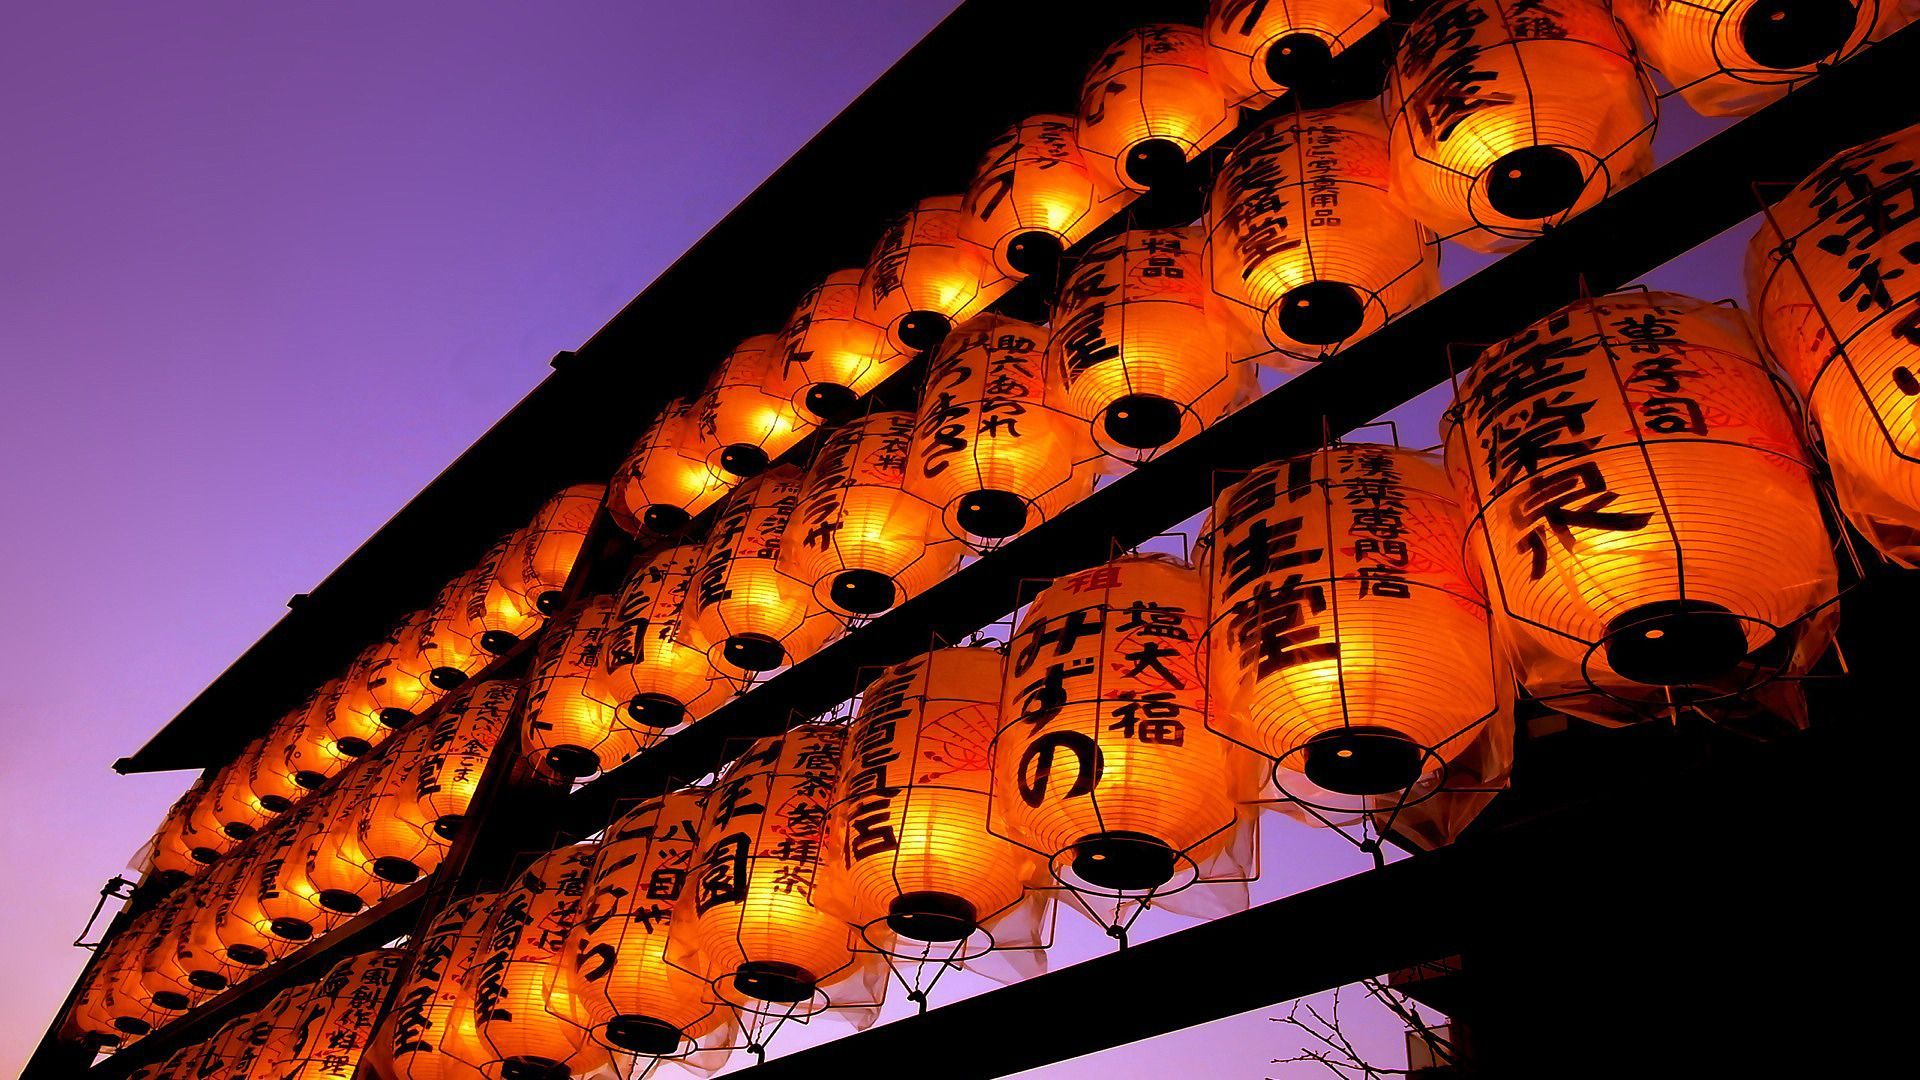 Chinese Lantern Wallpapers Top Free Chinese Lantern Backgrounds Wallpaperaccess